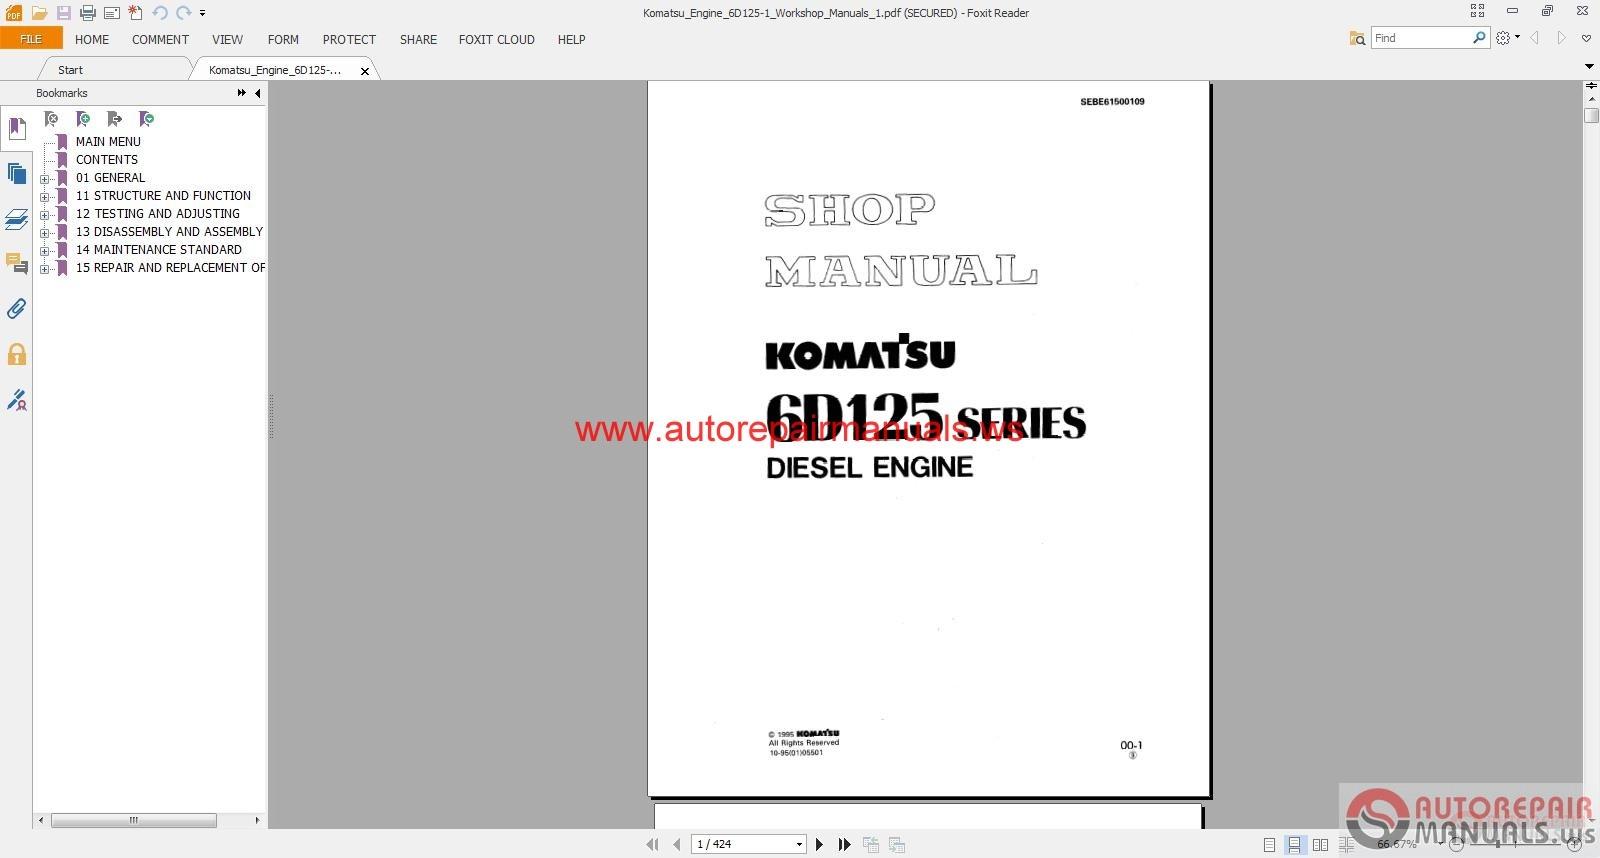 komatsu engine 6d125 1 workshop manuals auto repair. Black Bedroom Furniture Sets. Home Design Ideas